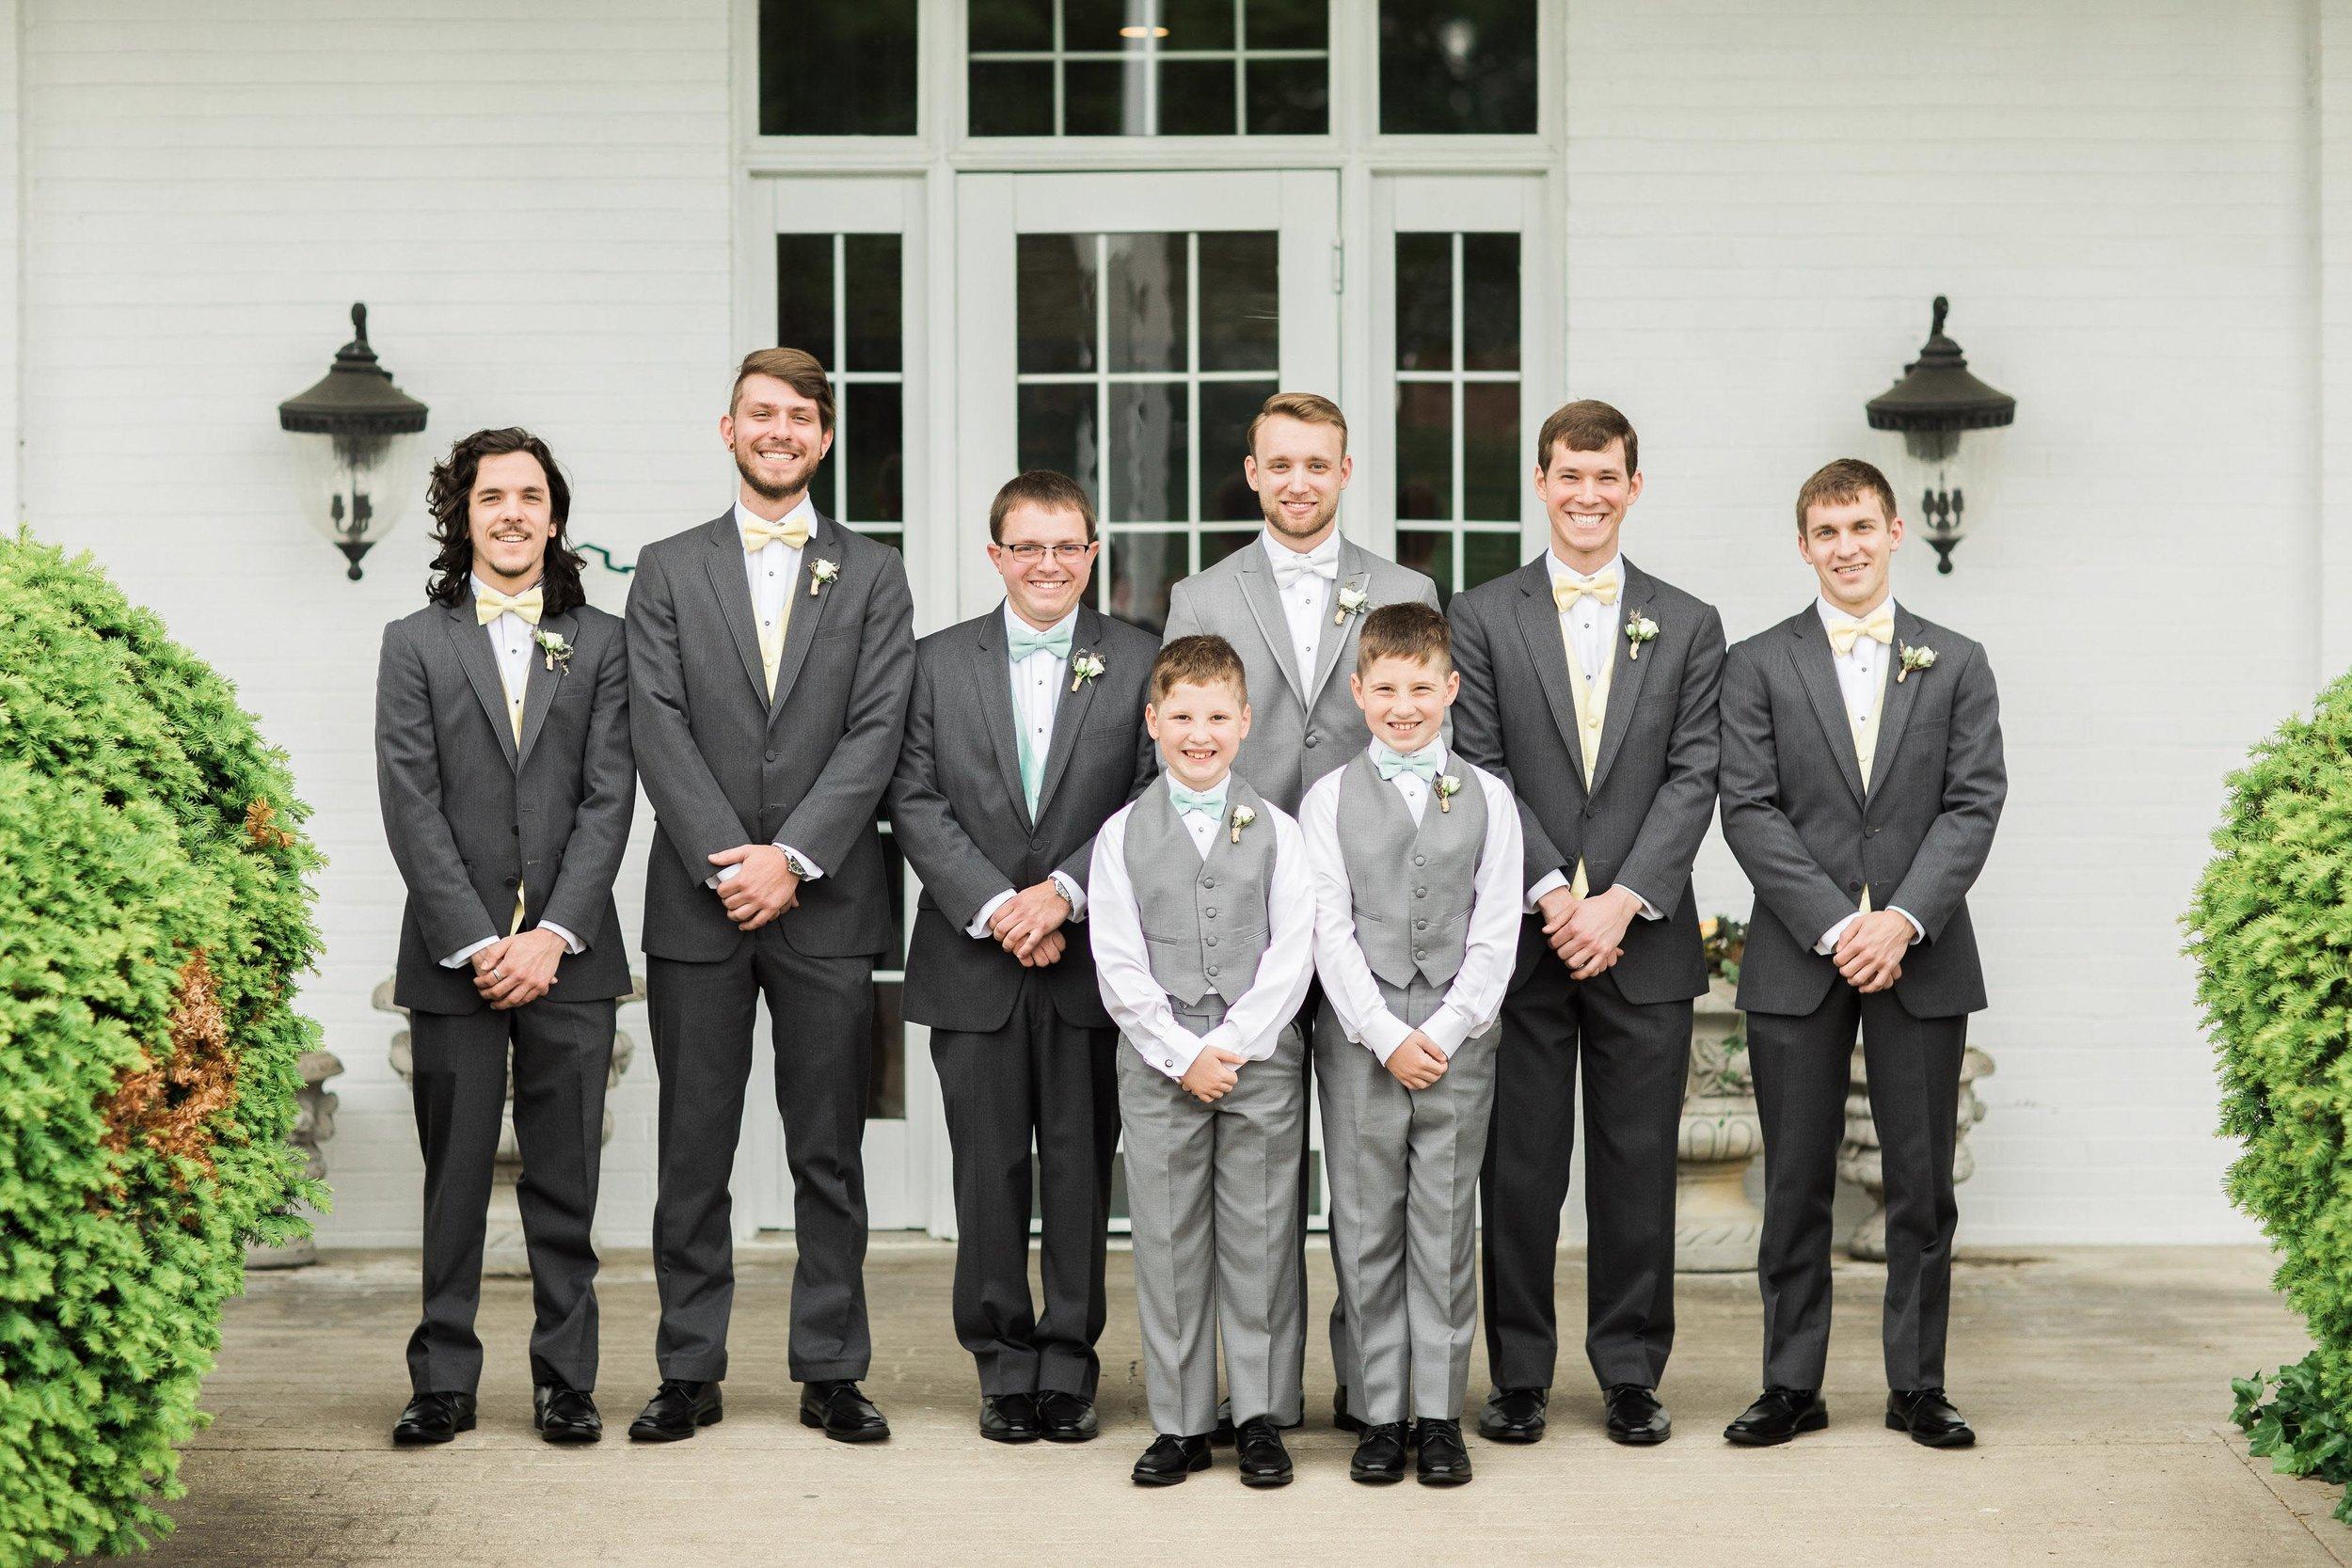 pebble creek golf course wedding-1.jpg